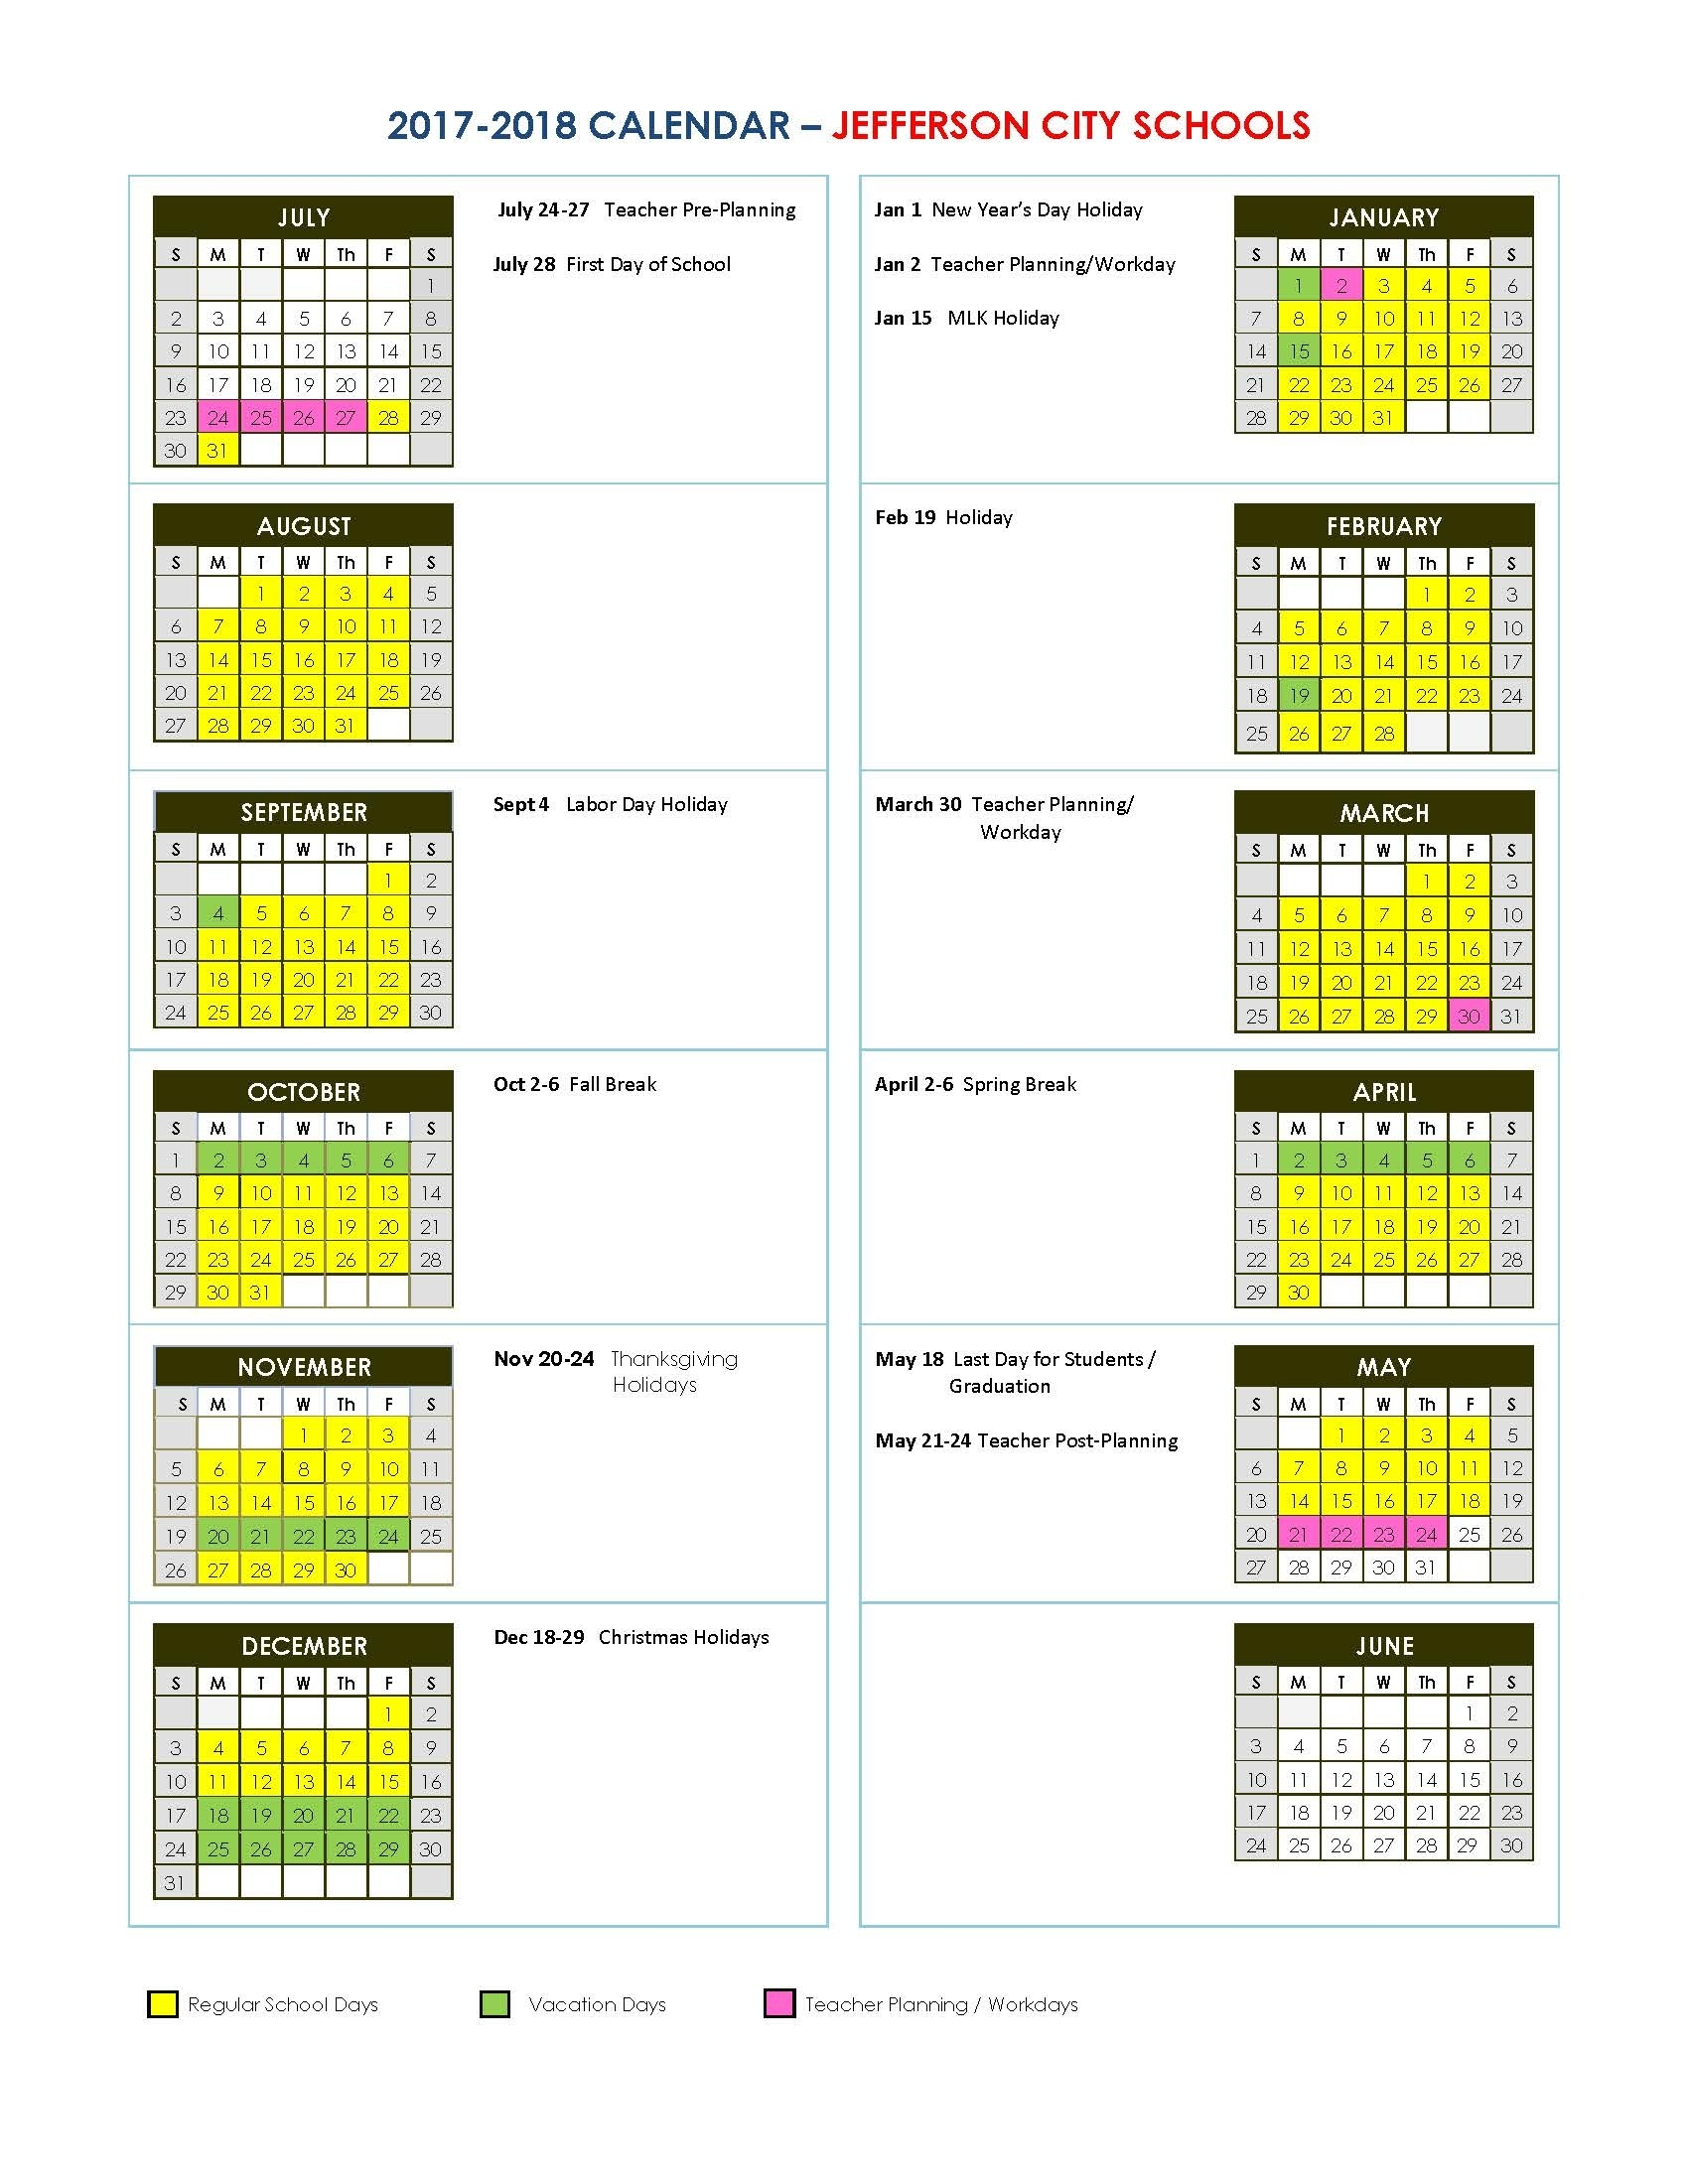 Jefferson City High School School Calendar Baltimore City